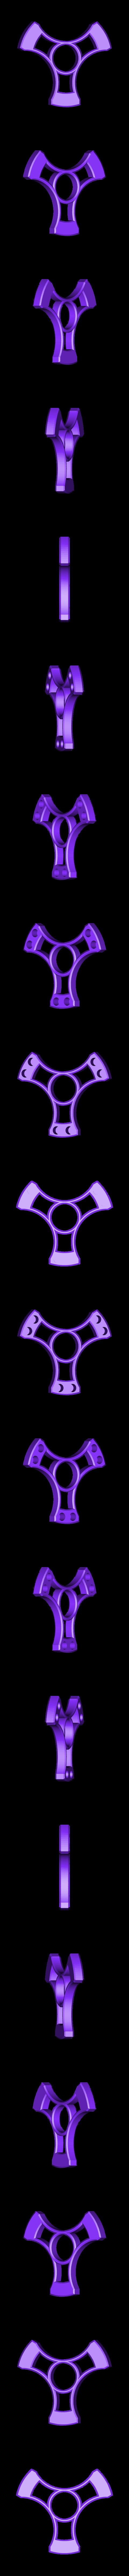 5.STL Download free STL file Fidget Spinner Toy • 3D print template, listart